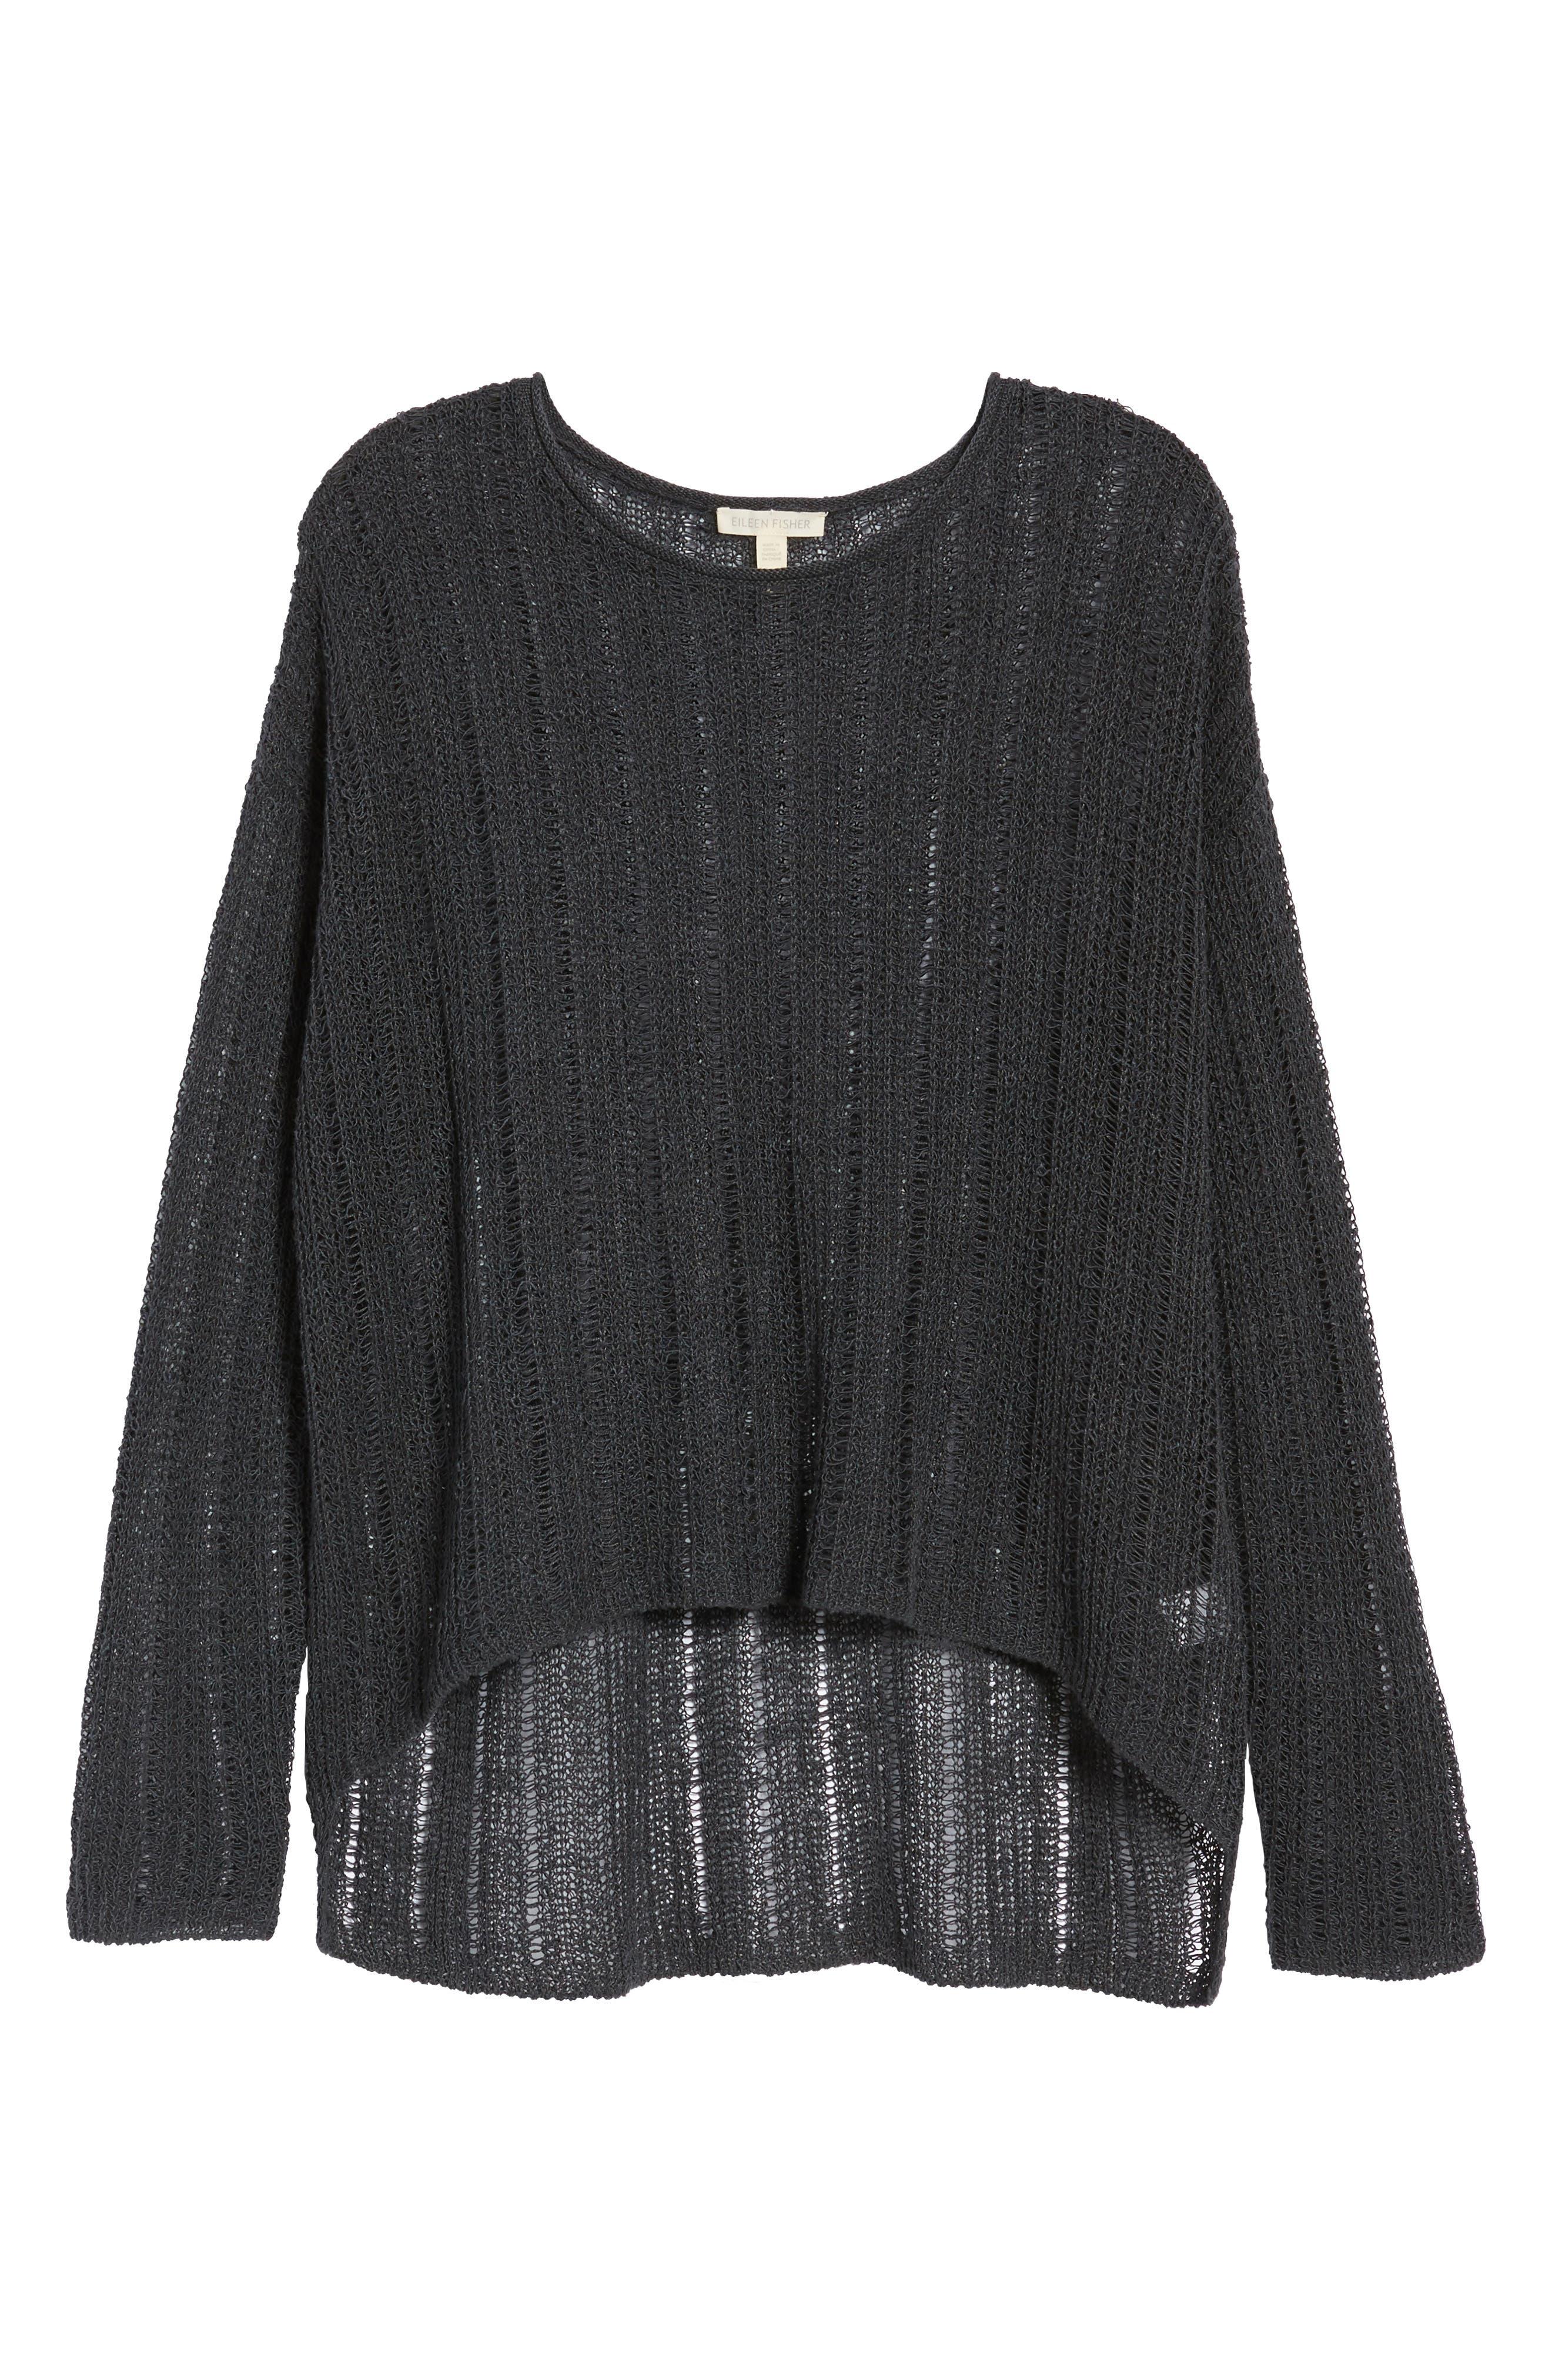 Open Knit Organic Linen Blend Sweater,                             Alternate thumbnail 7, color,                             025